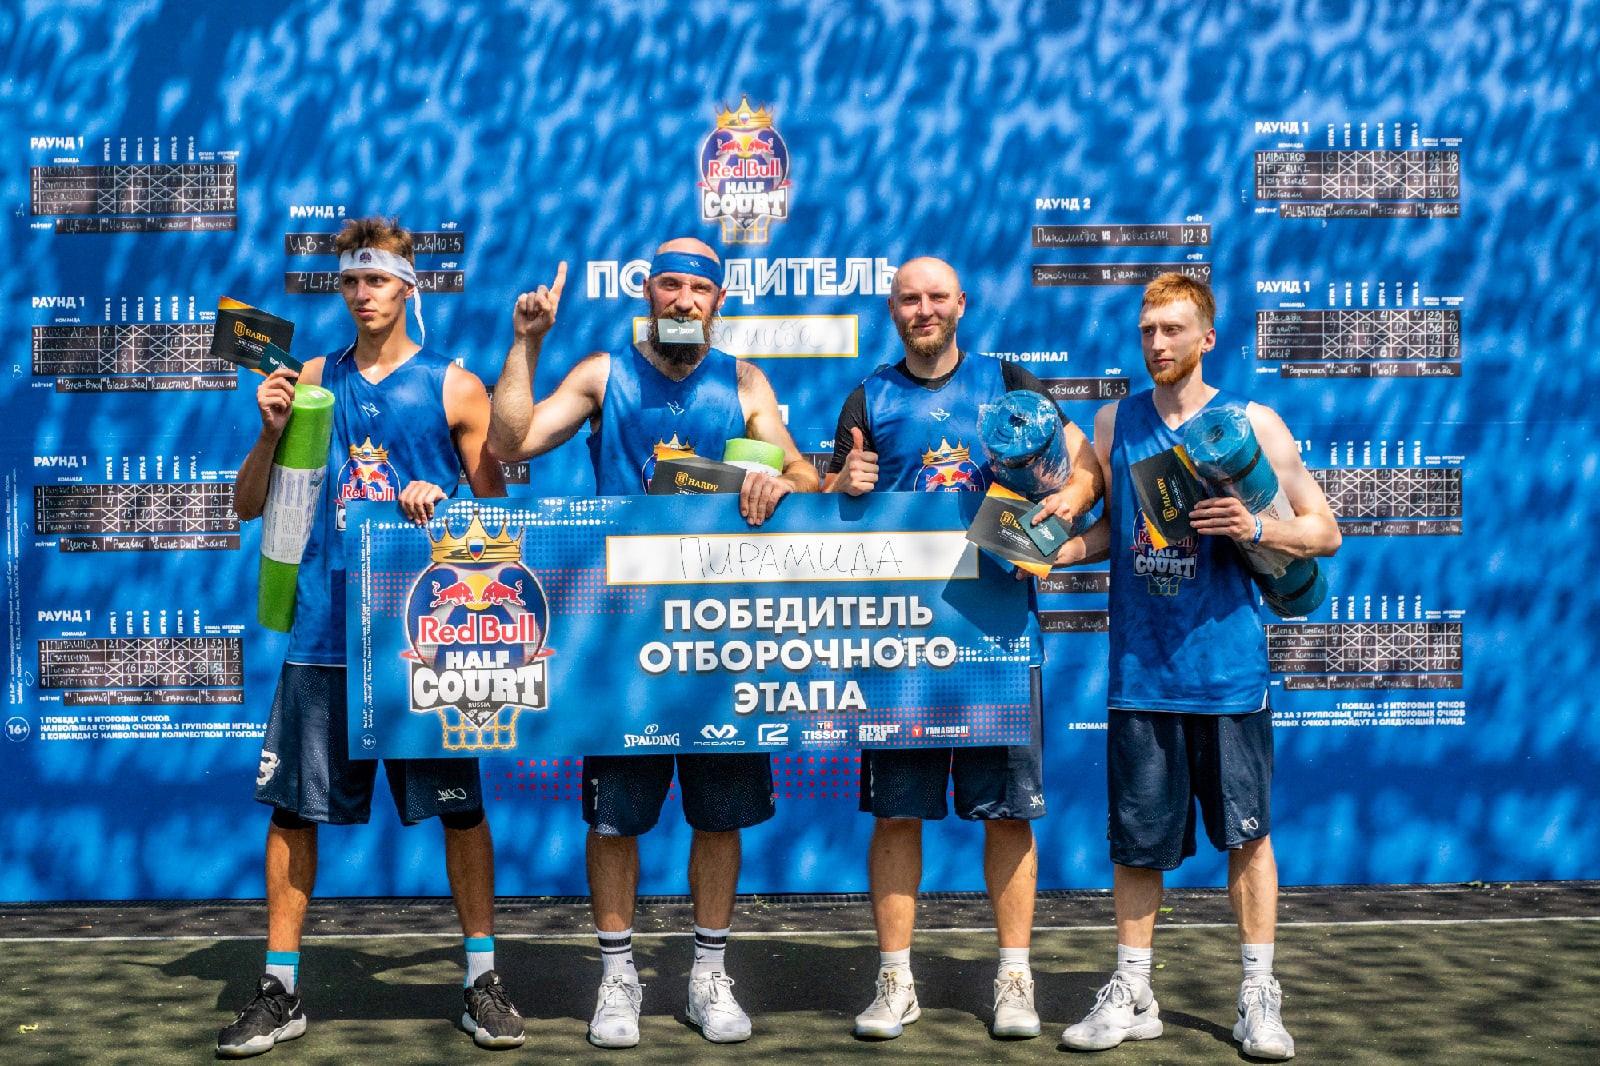 Red Bull Half Court Краснодар 2021